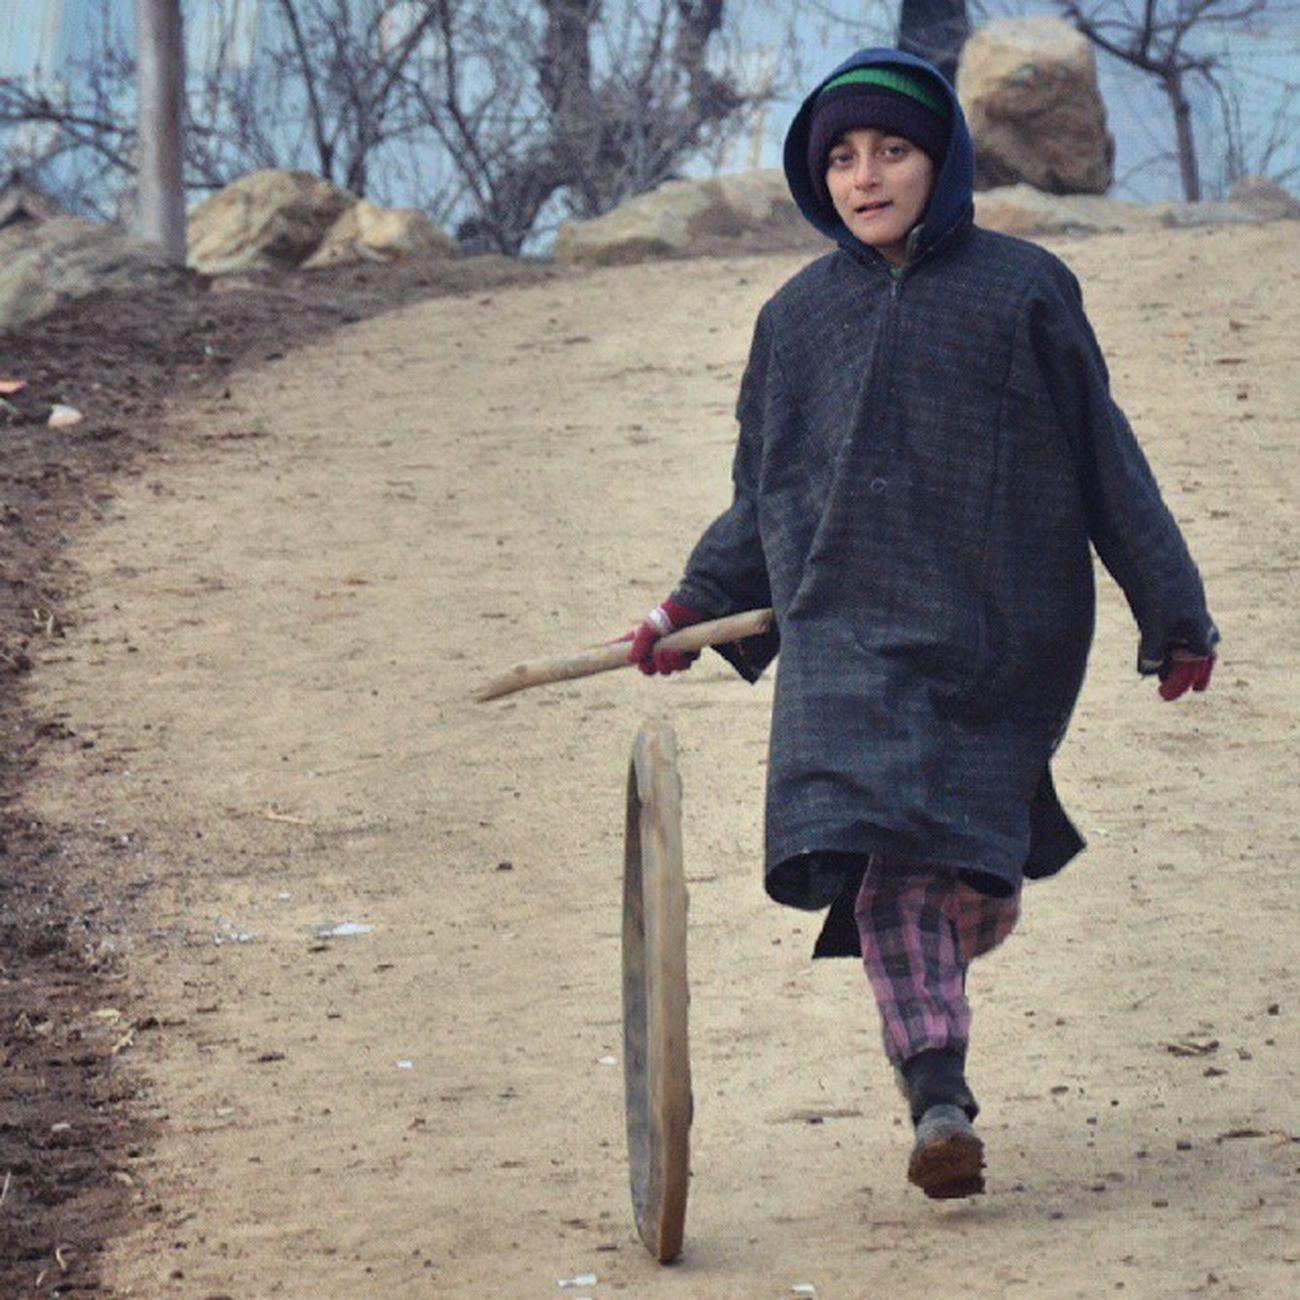 Kasheer Kashmir Pakistan ChildrenOfKashmir PhiranClad KashmirTalks Itravel IExplore Iclick IExploreKashmir IAmKashmir IPhotographKashmir ILoveKashmir Iphotograph Revoshotsphotography Revoshots Rebel Revo Nikon Bandipur Freedom